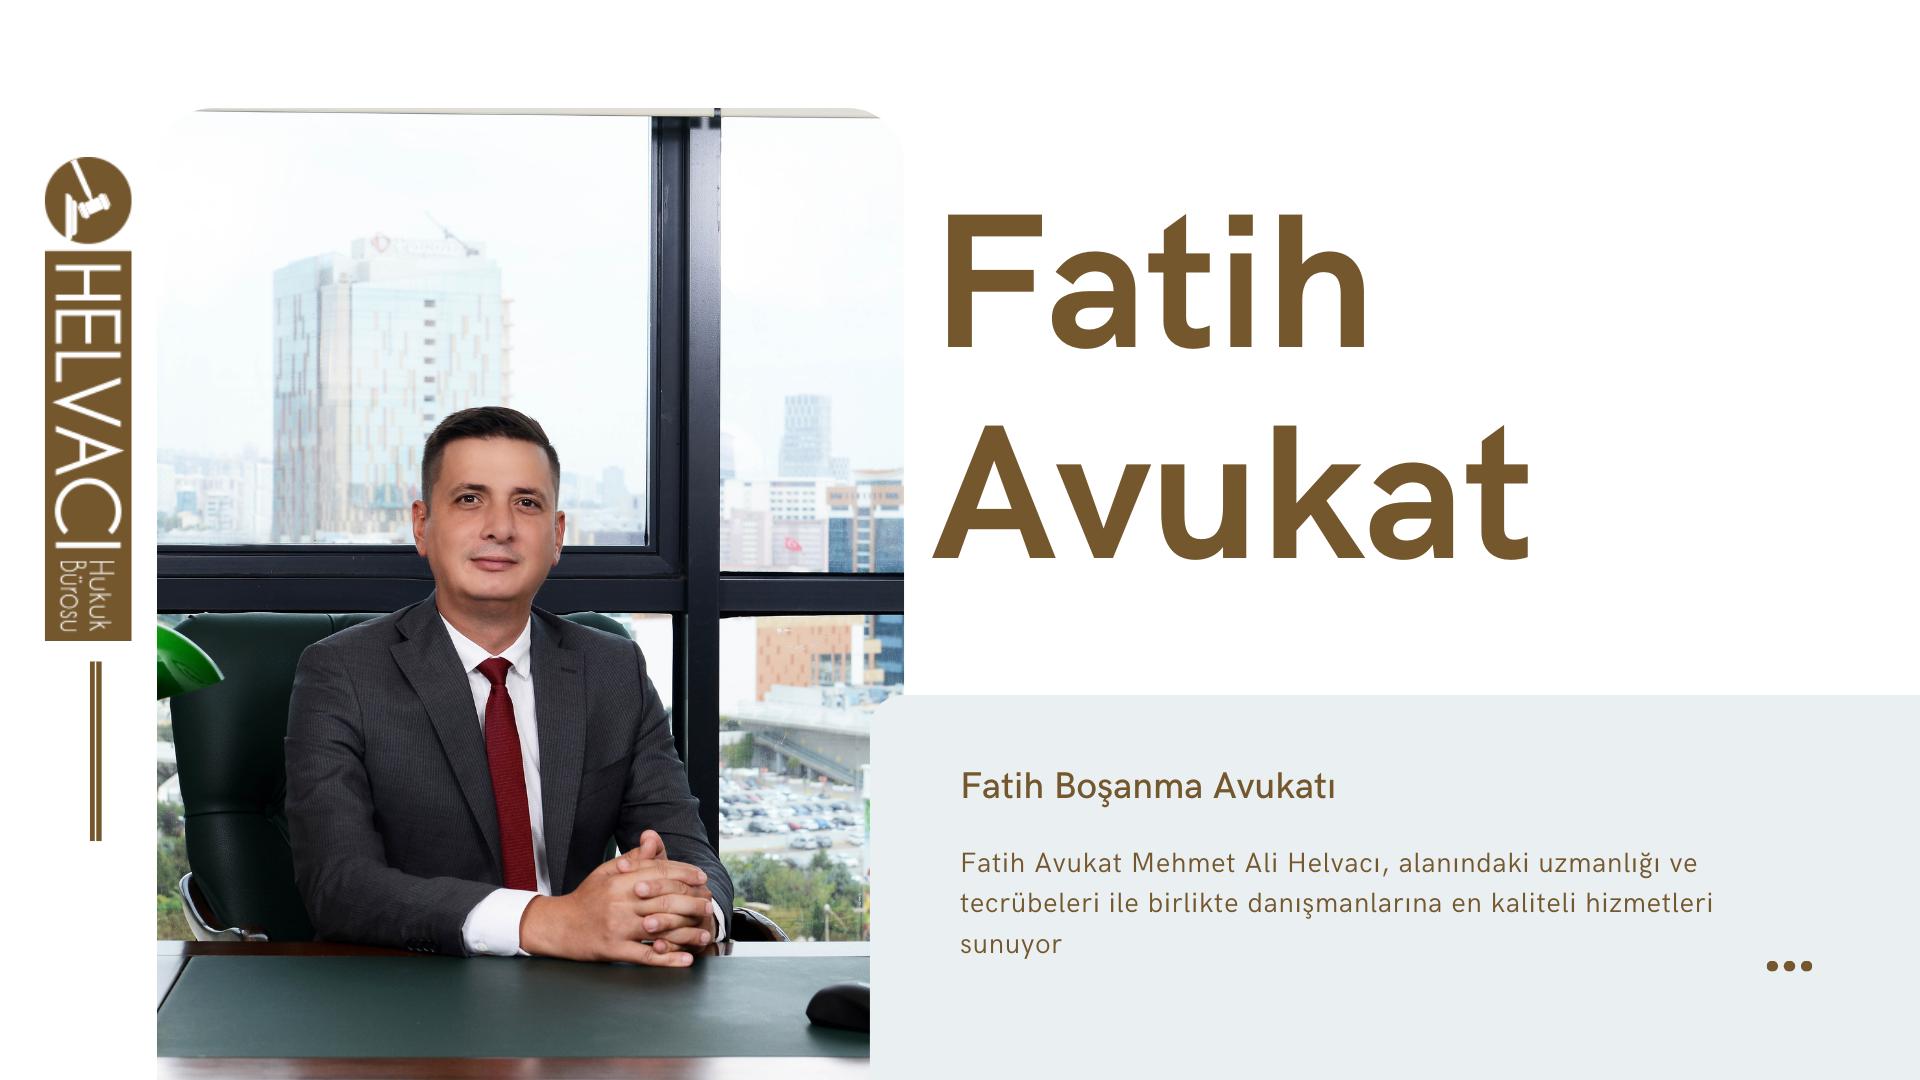 Fatih Avukat